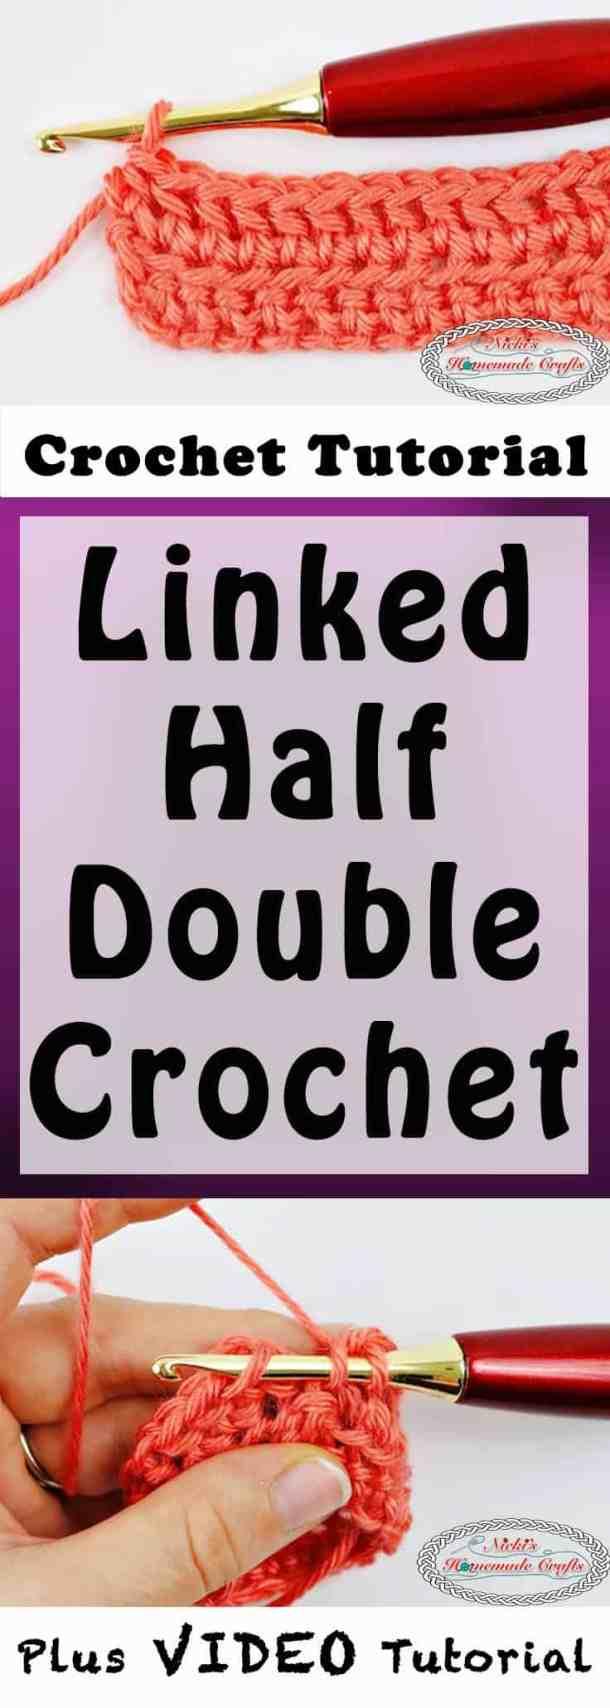 Linked Half Double Crochet - Crochet Tutorial - Photo and Video - Nicki's Homemade Crafts #linked #halfdoublecrochet #crochet #crochettutorial #learn #howto #diy #easy #best #secret